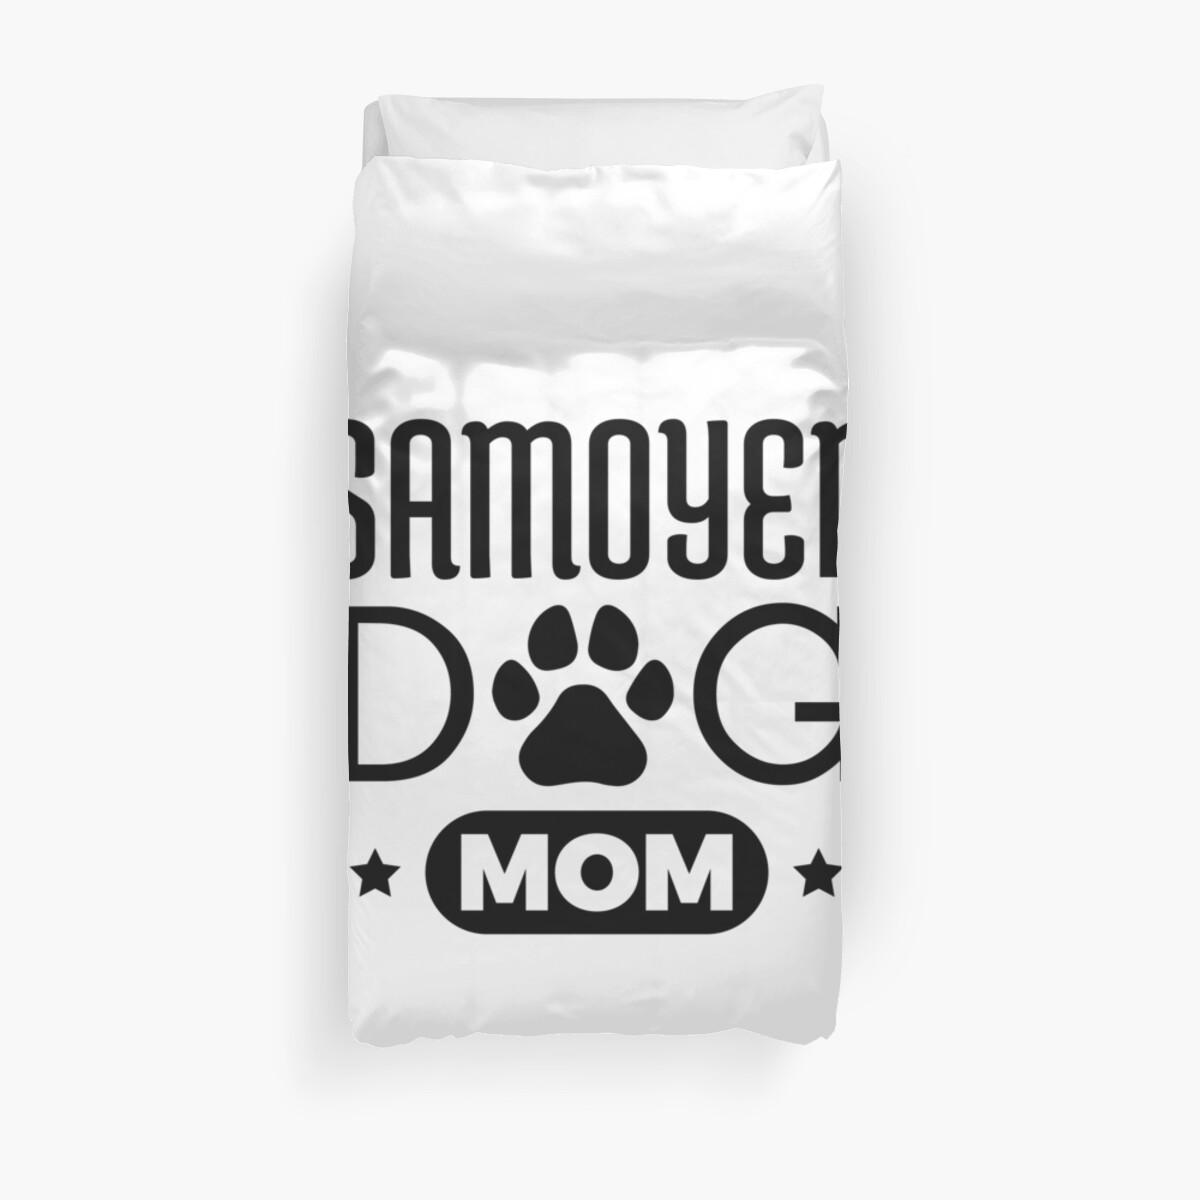 Samoyed Gift - Gifts For Dog Mom